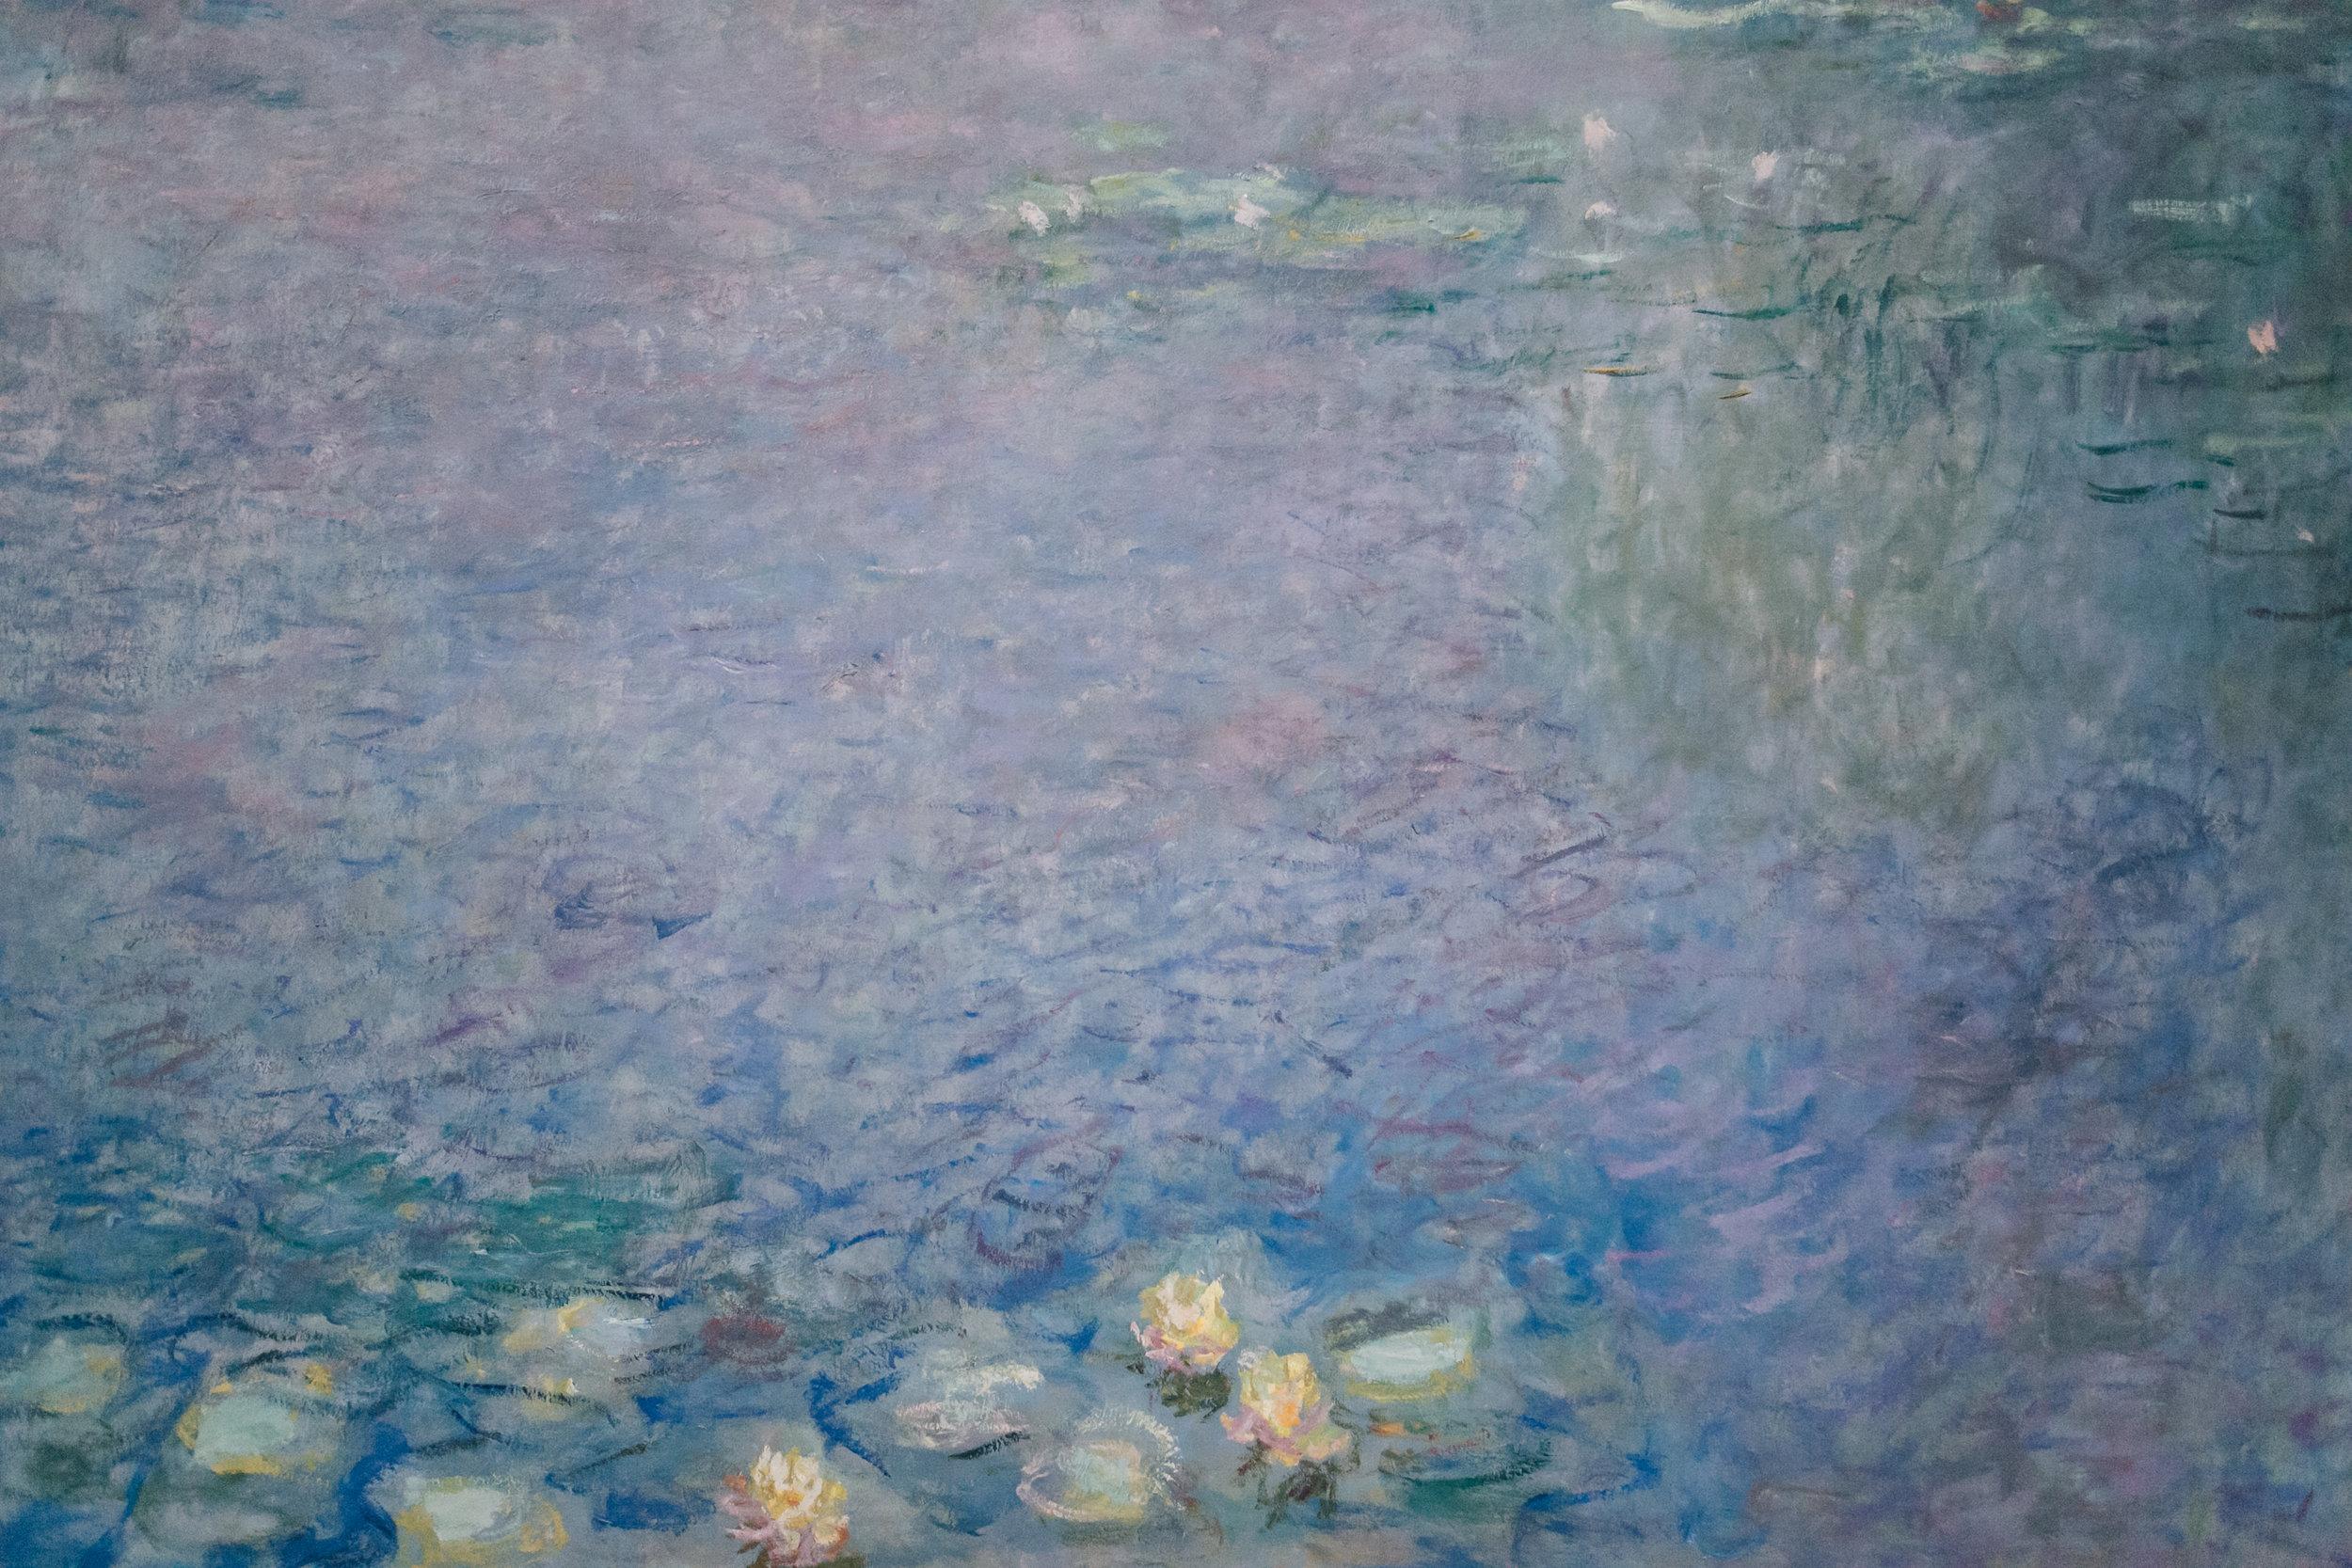 Paris in the Winter by Haarkon. Claude Monet's Waterlilies at Musee de L'Orangerie.